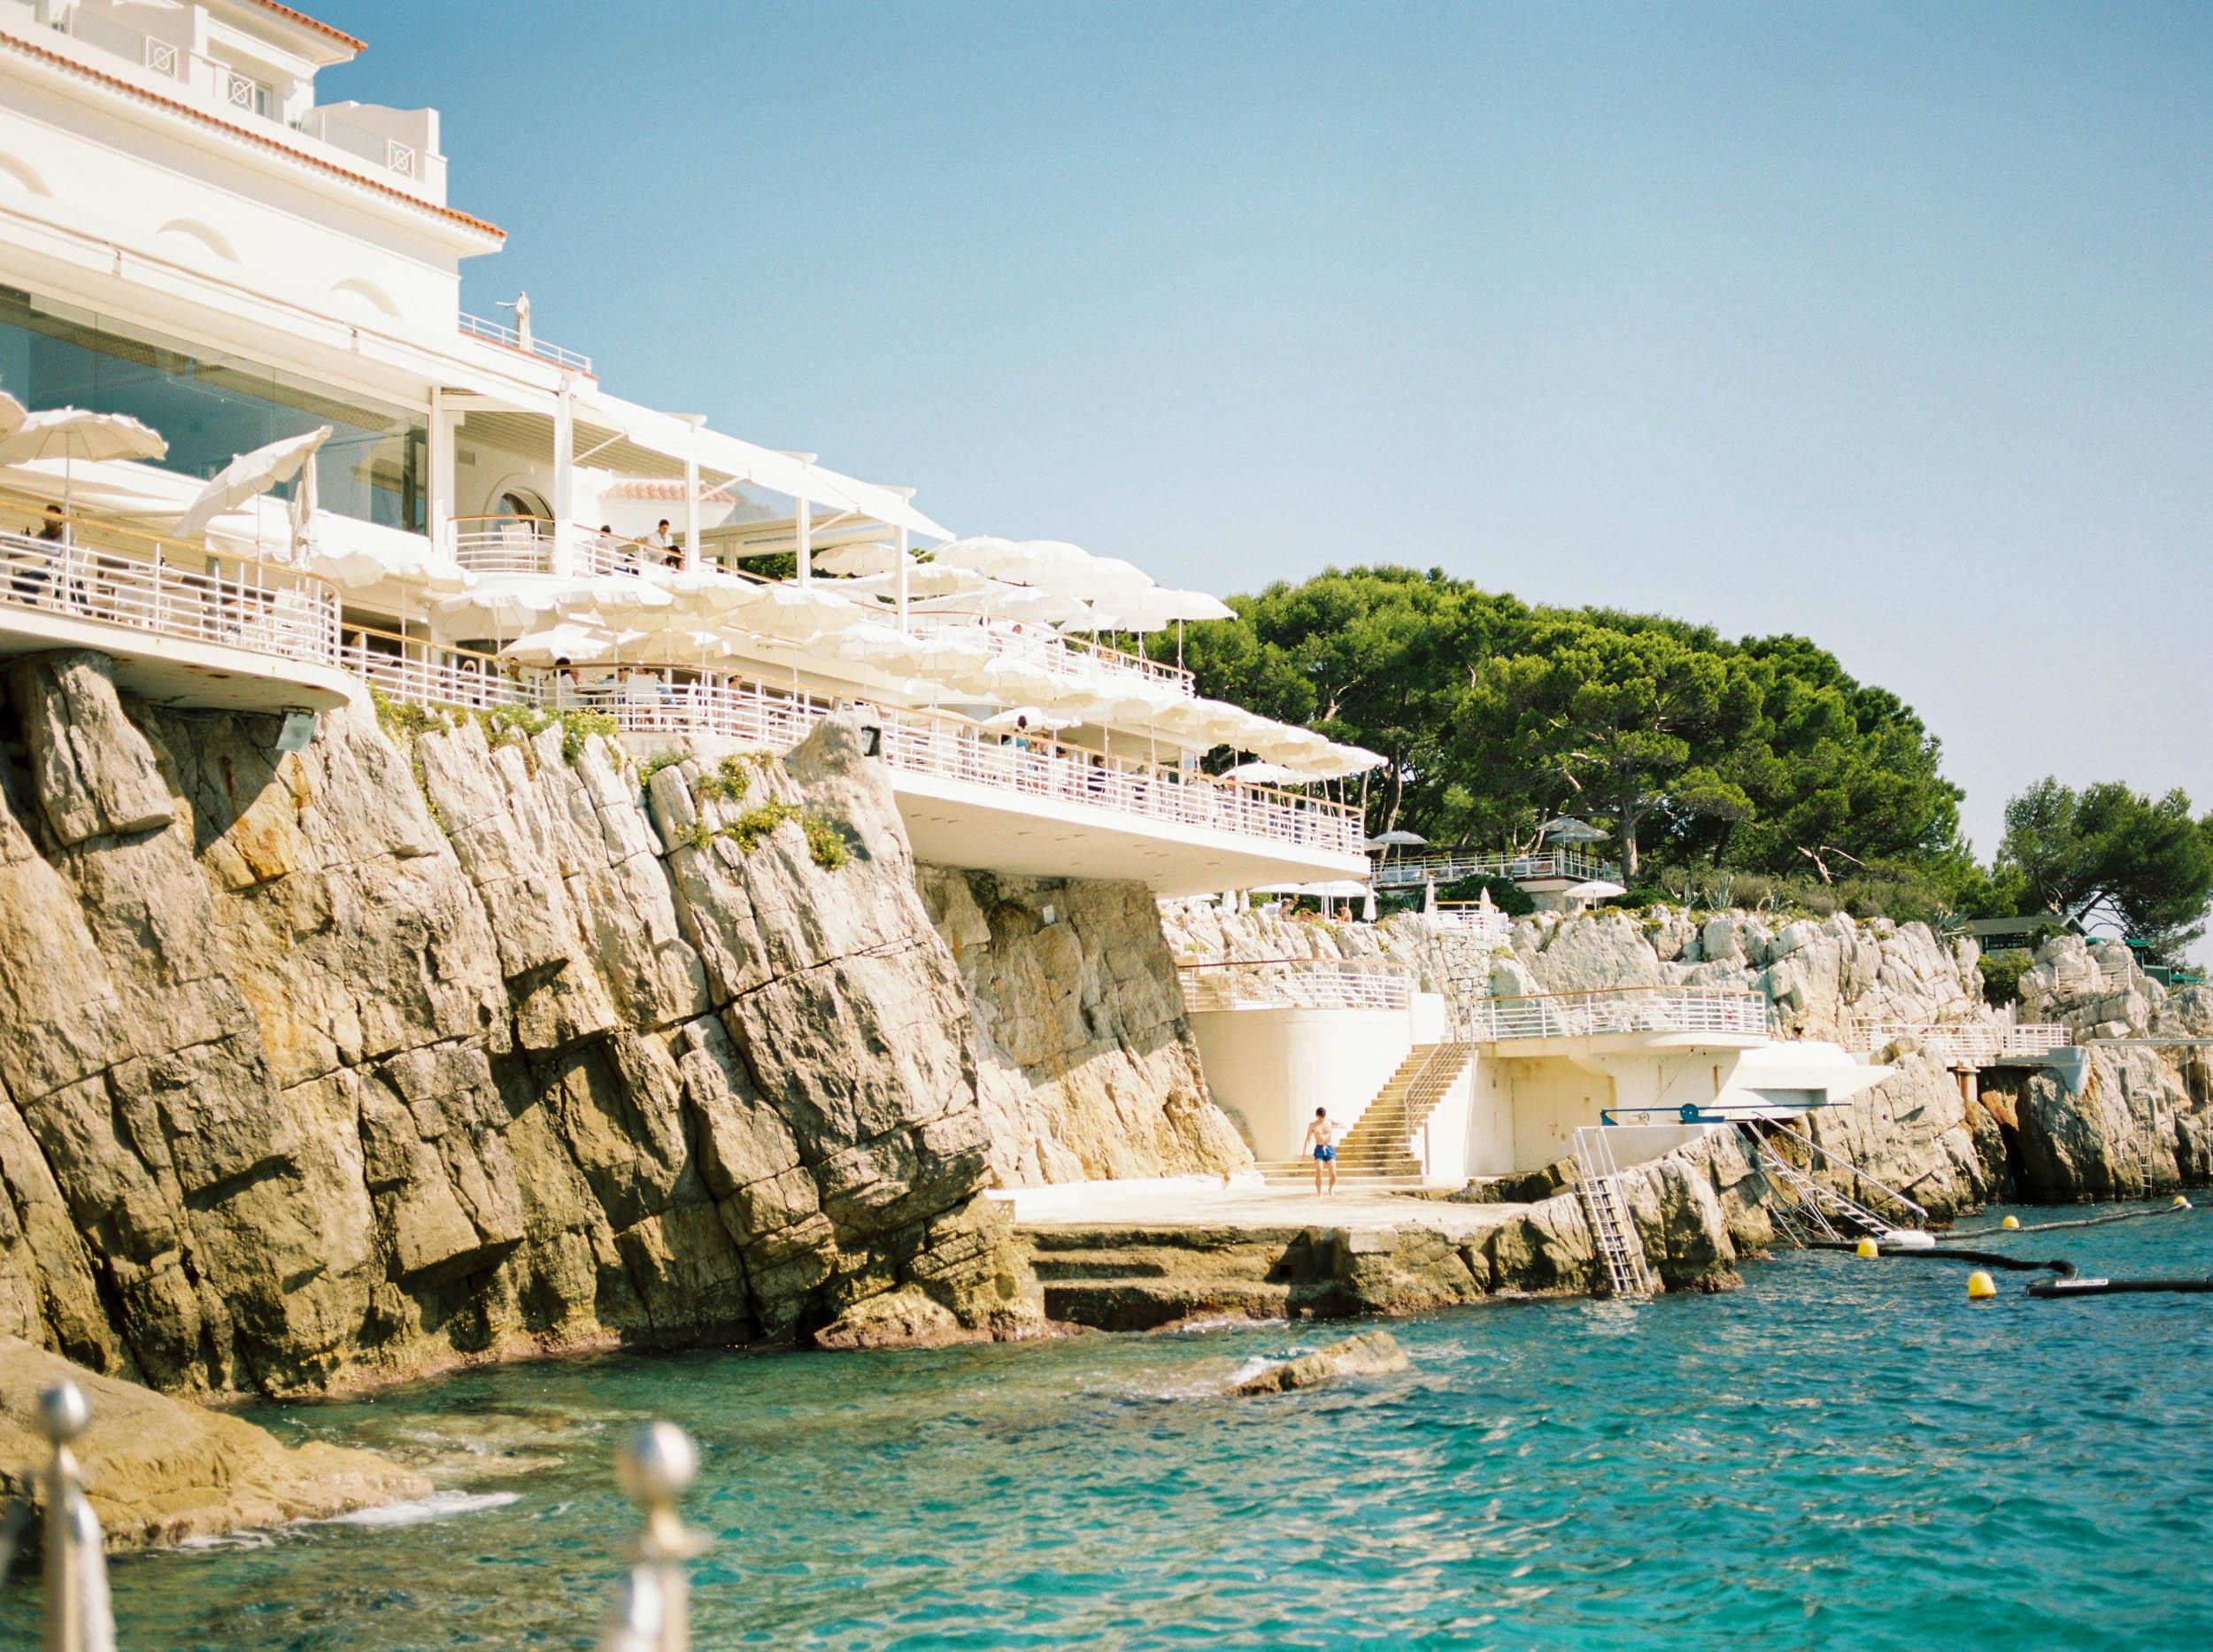 Amy O'Boyle Photography- Destination & UK Fine Art Film Wedding Photographer- South of France Hotel Du Cao Eden Roc St Tropez Yacht-2.jpg